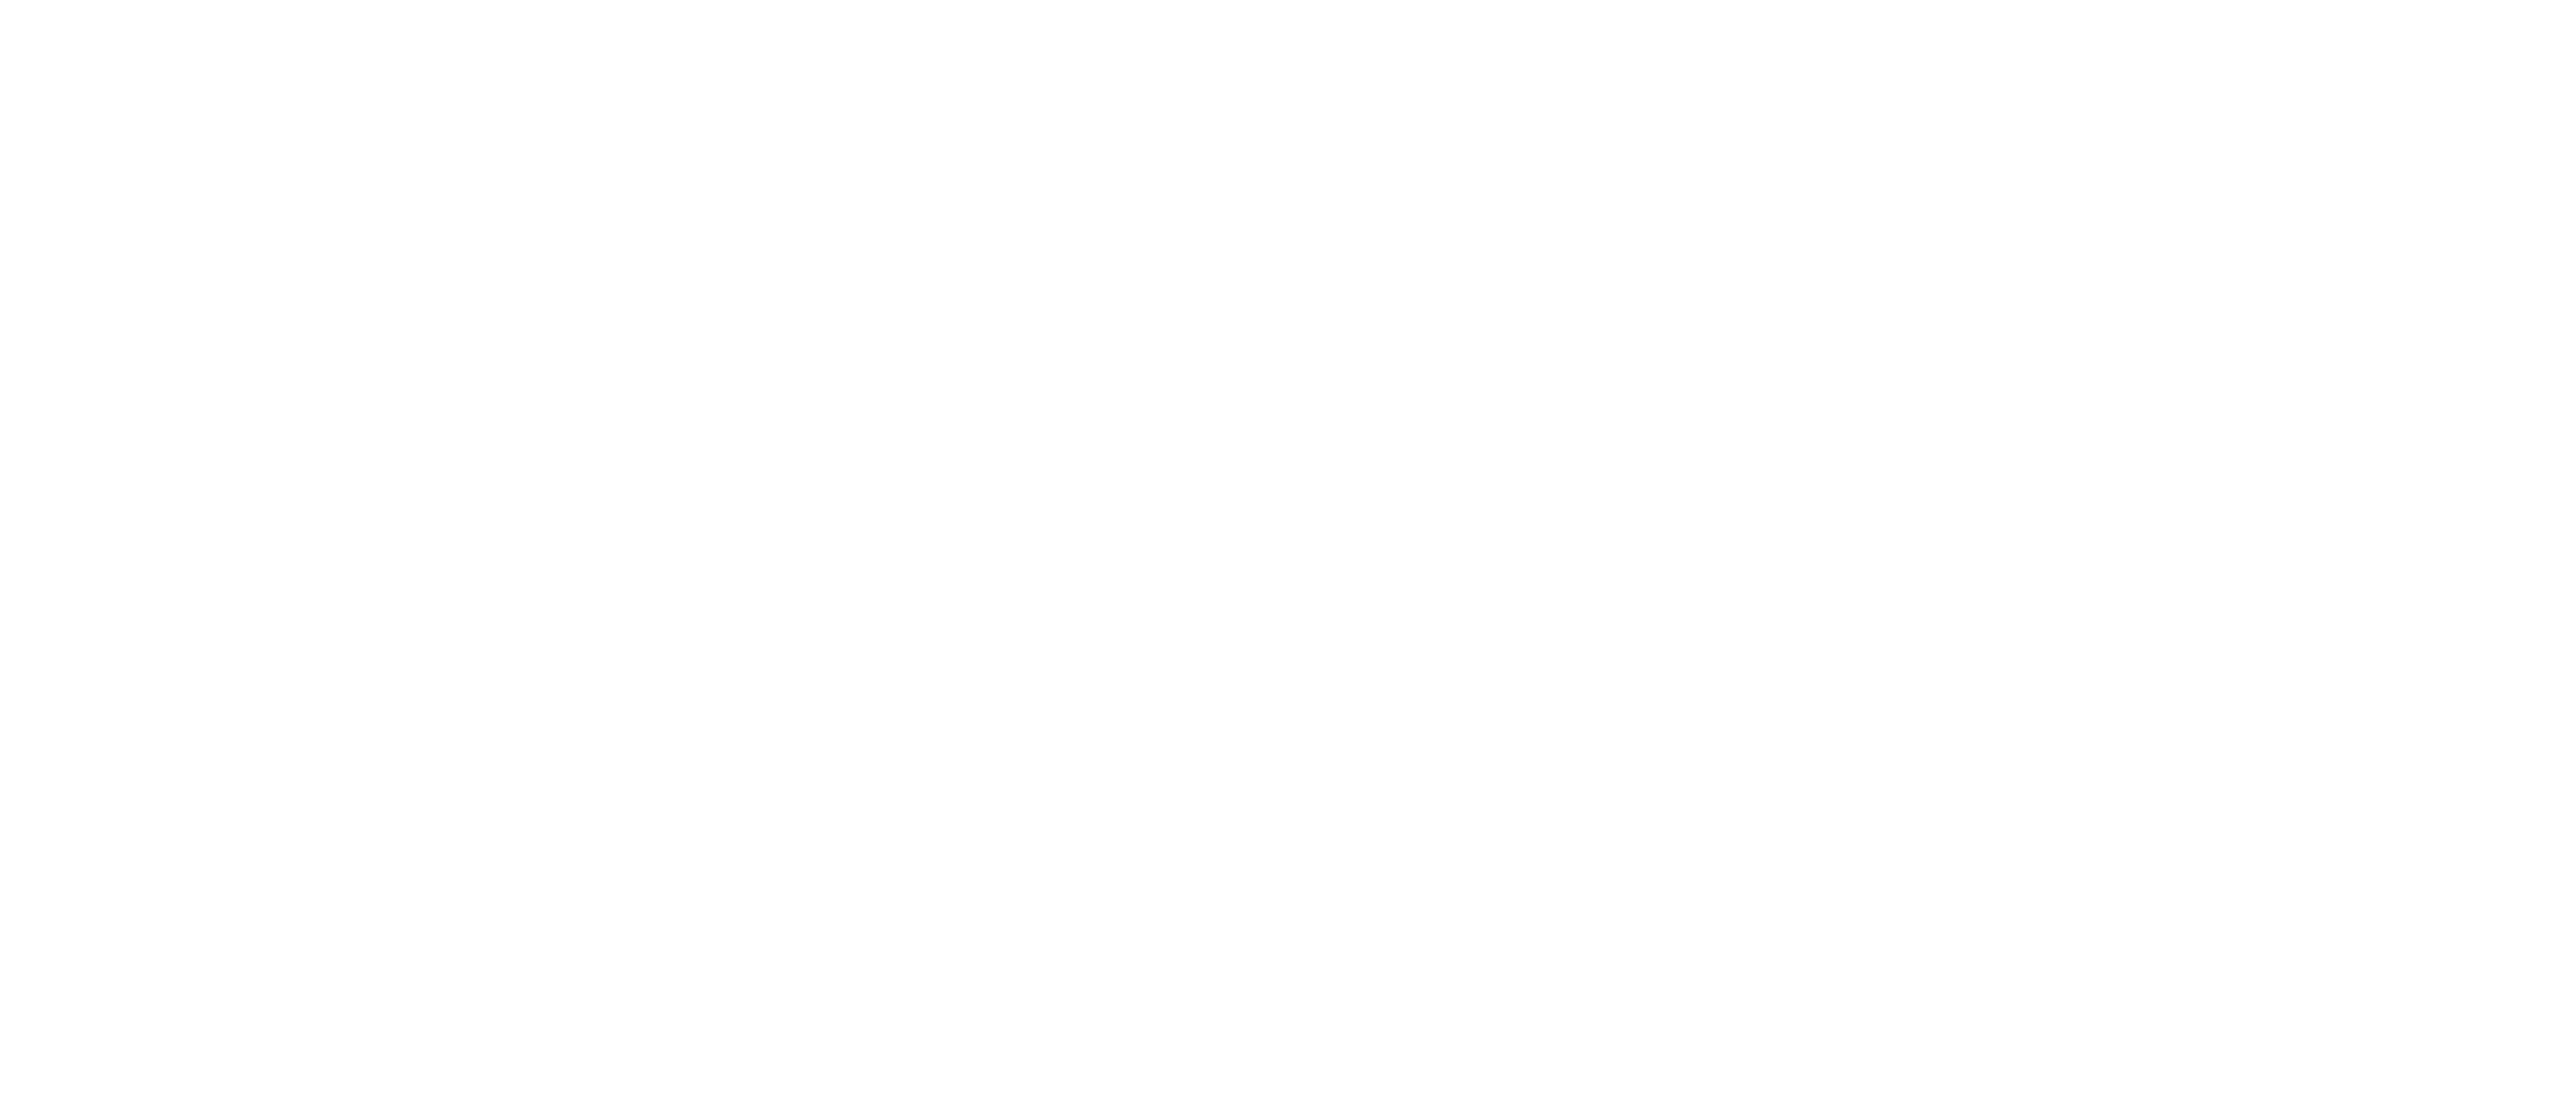 By Design Heroes